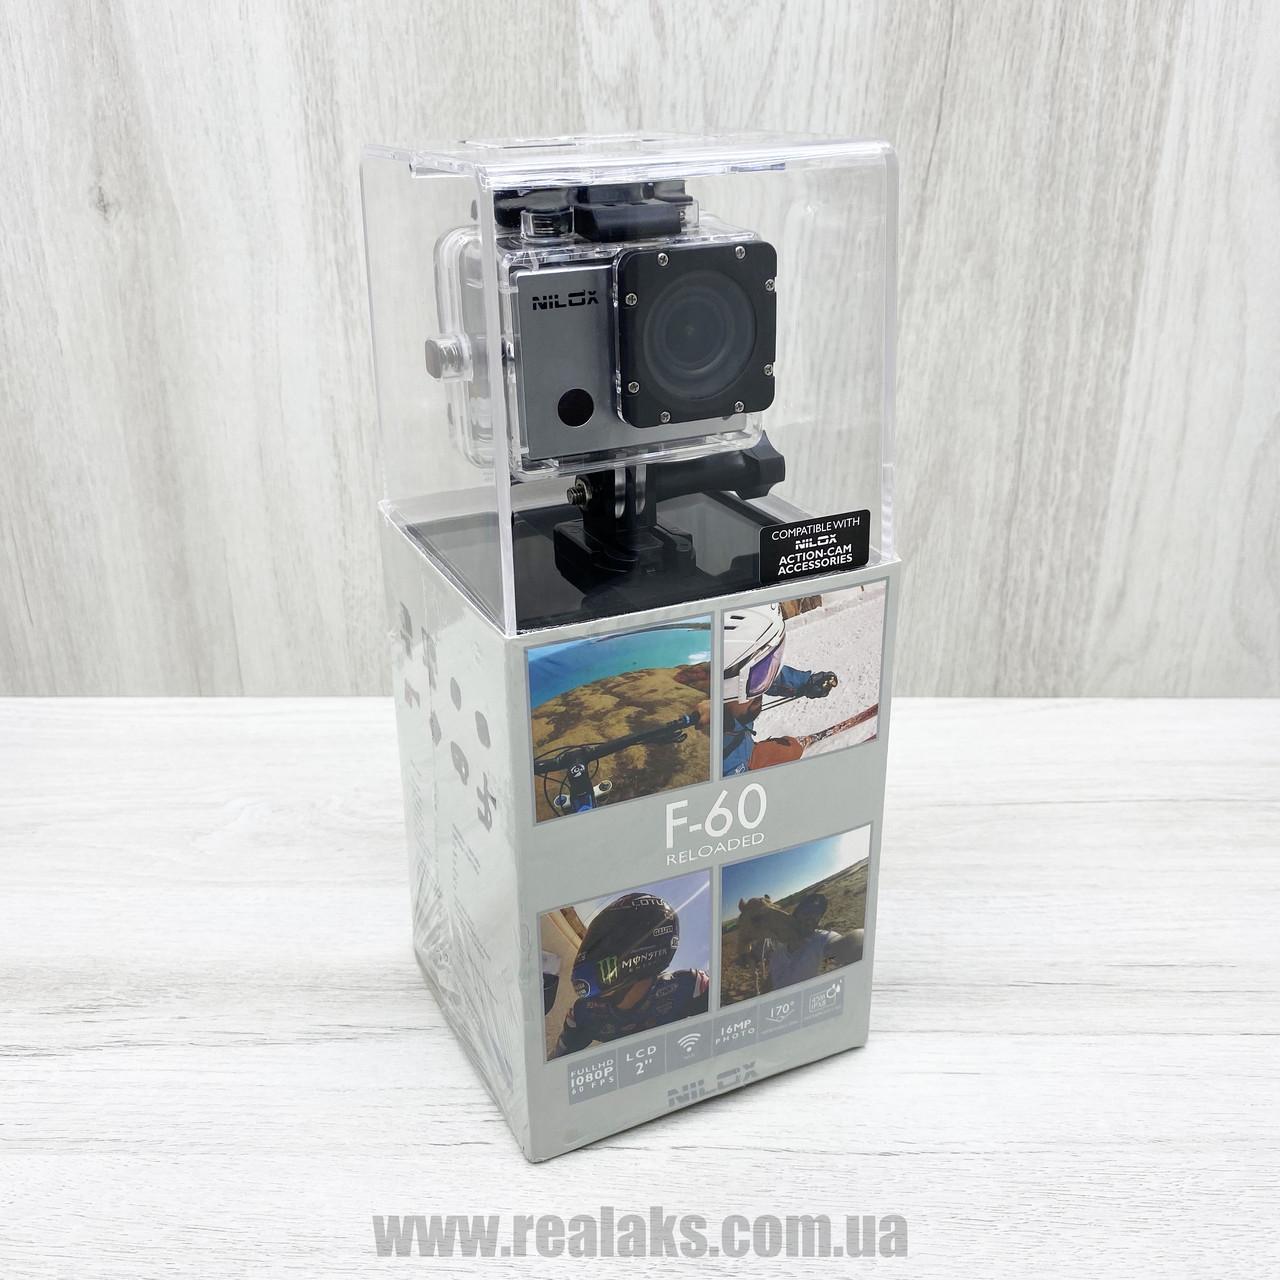 Камера NILOX F-60 RELOADED